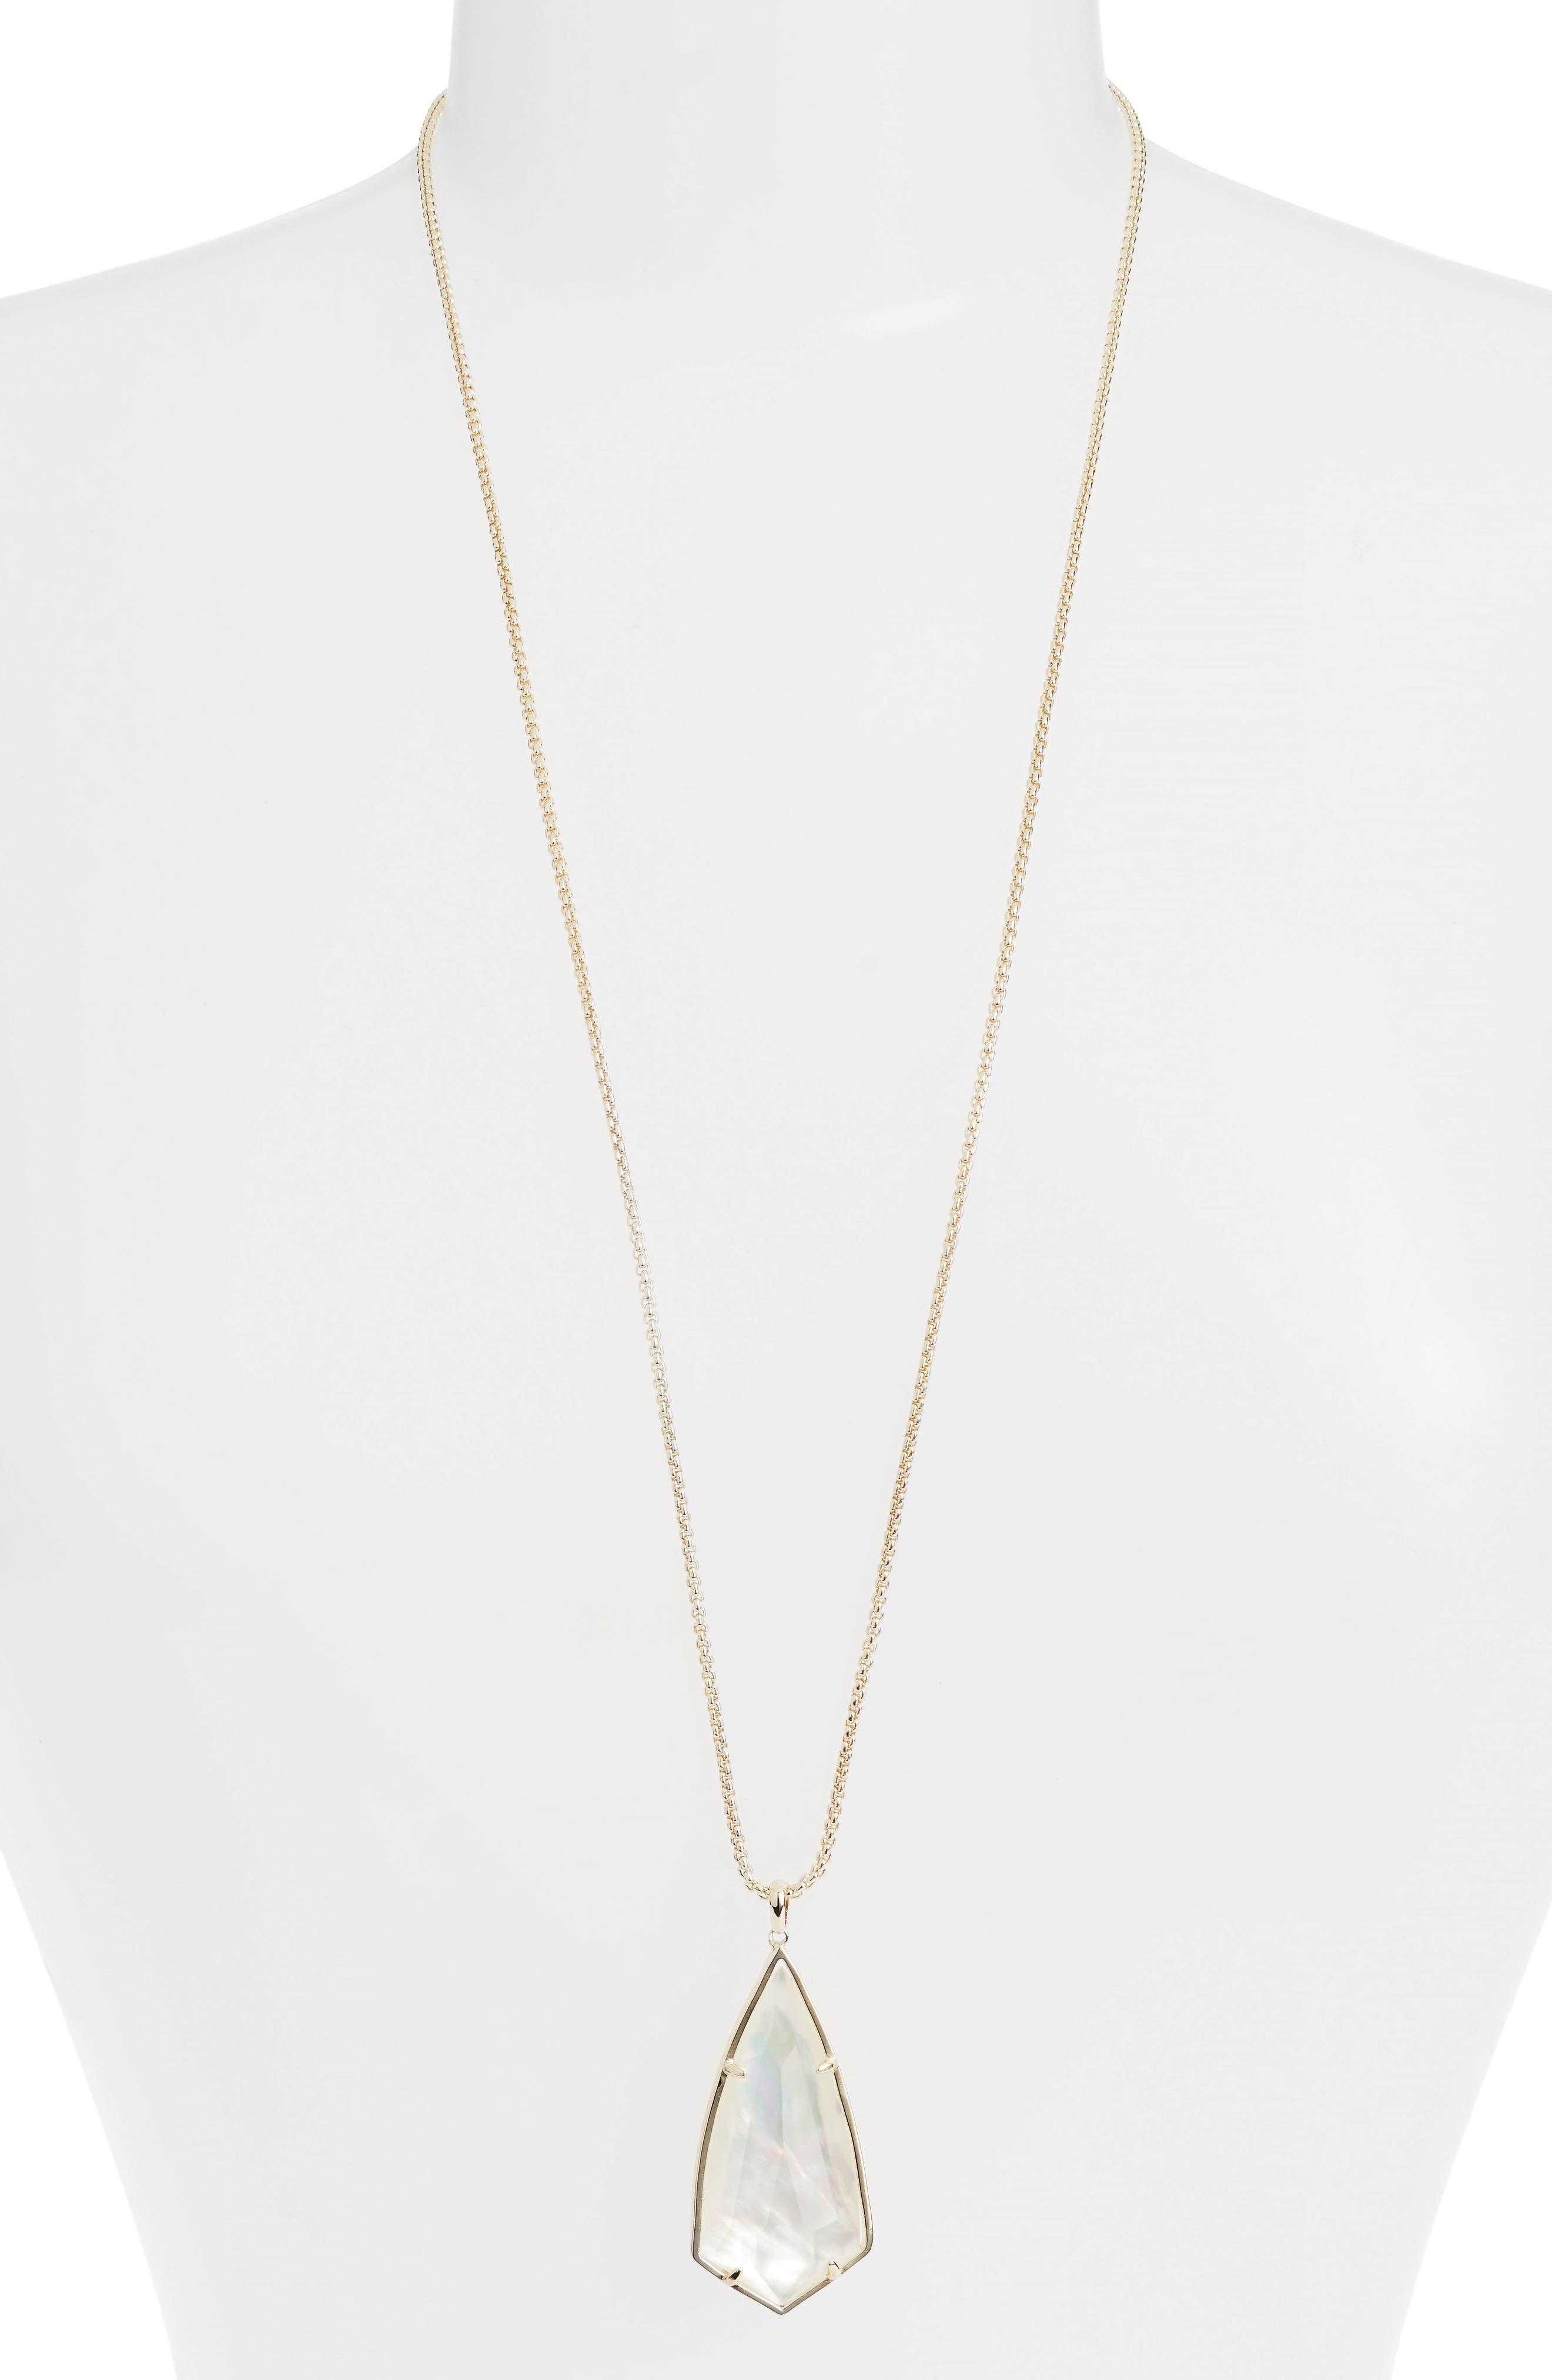 Kendra Scott 'Carole' Long Semiprecious Stone Pendant Necklace